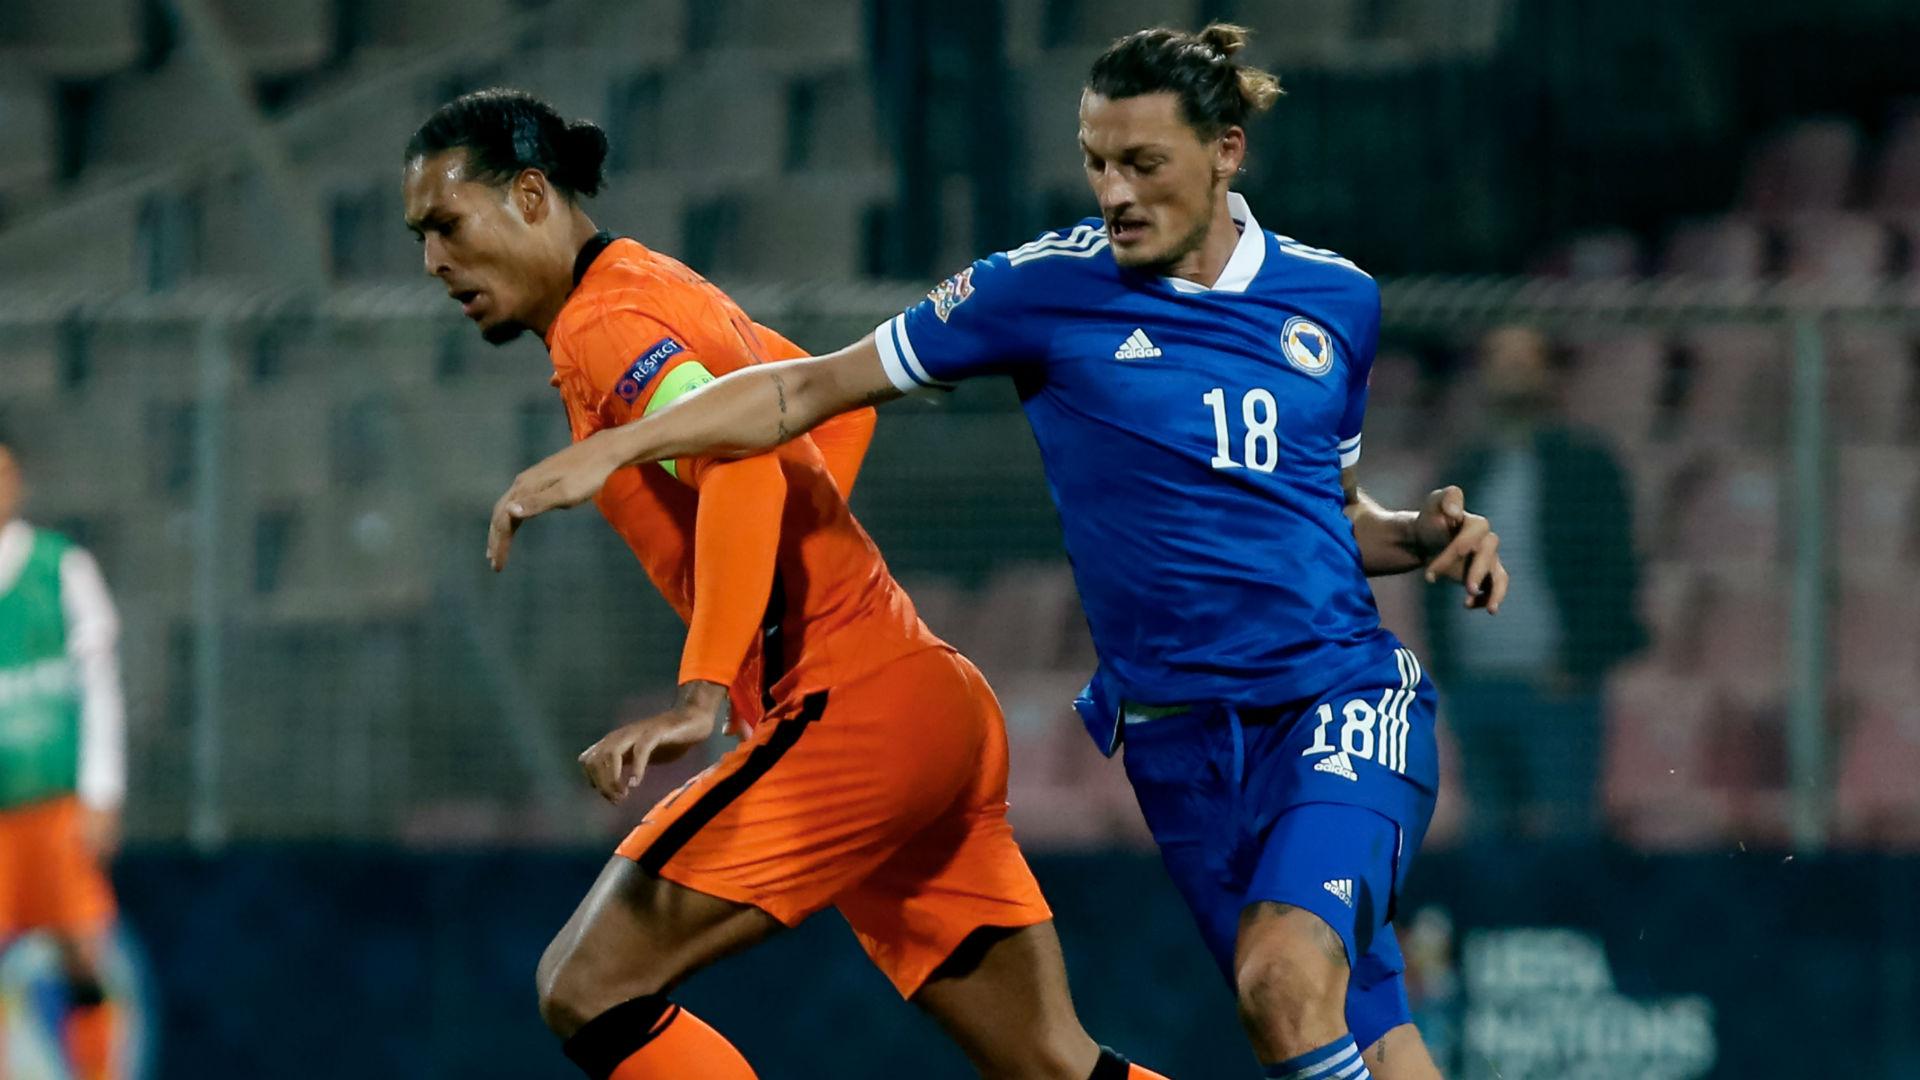 Bosnia-Herzegovina 0-0 Netherlands: De Boer draw leaves questions for new boss